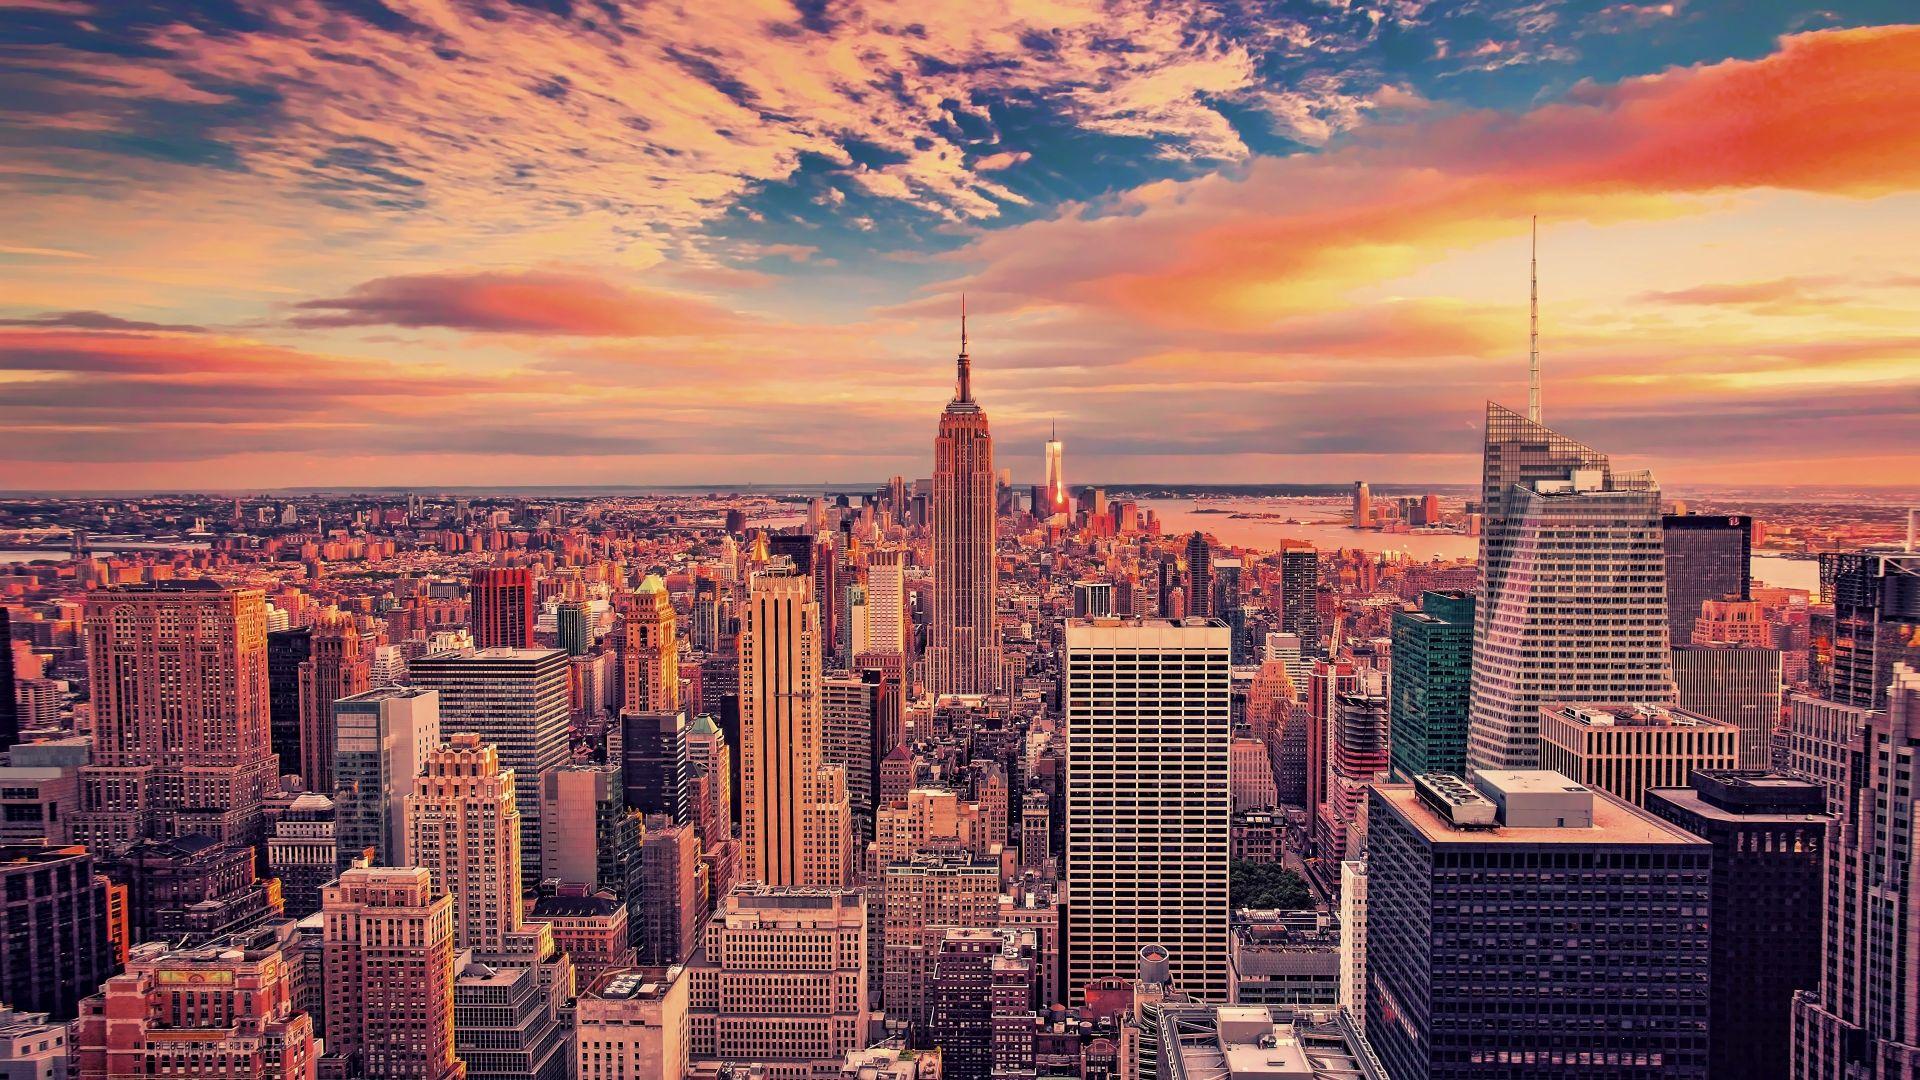 Desktop Wallpaper Empire State Building, Buildings